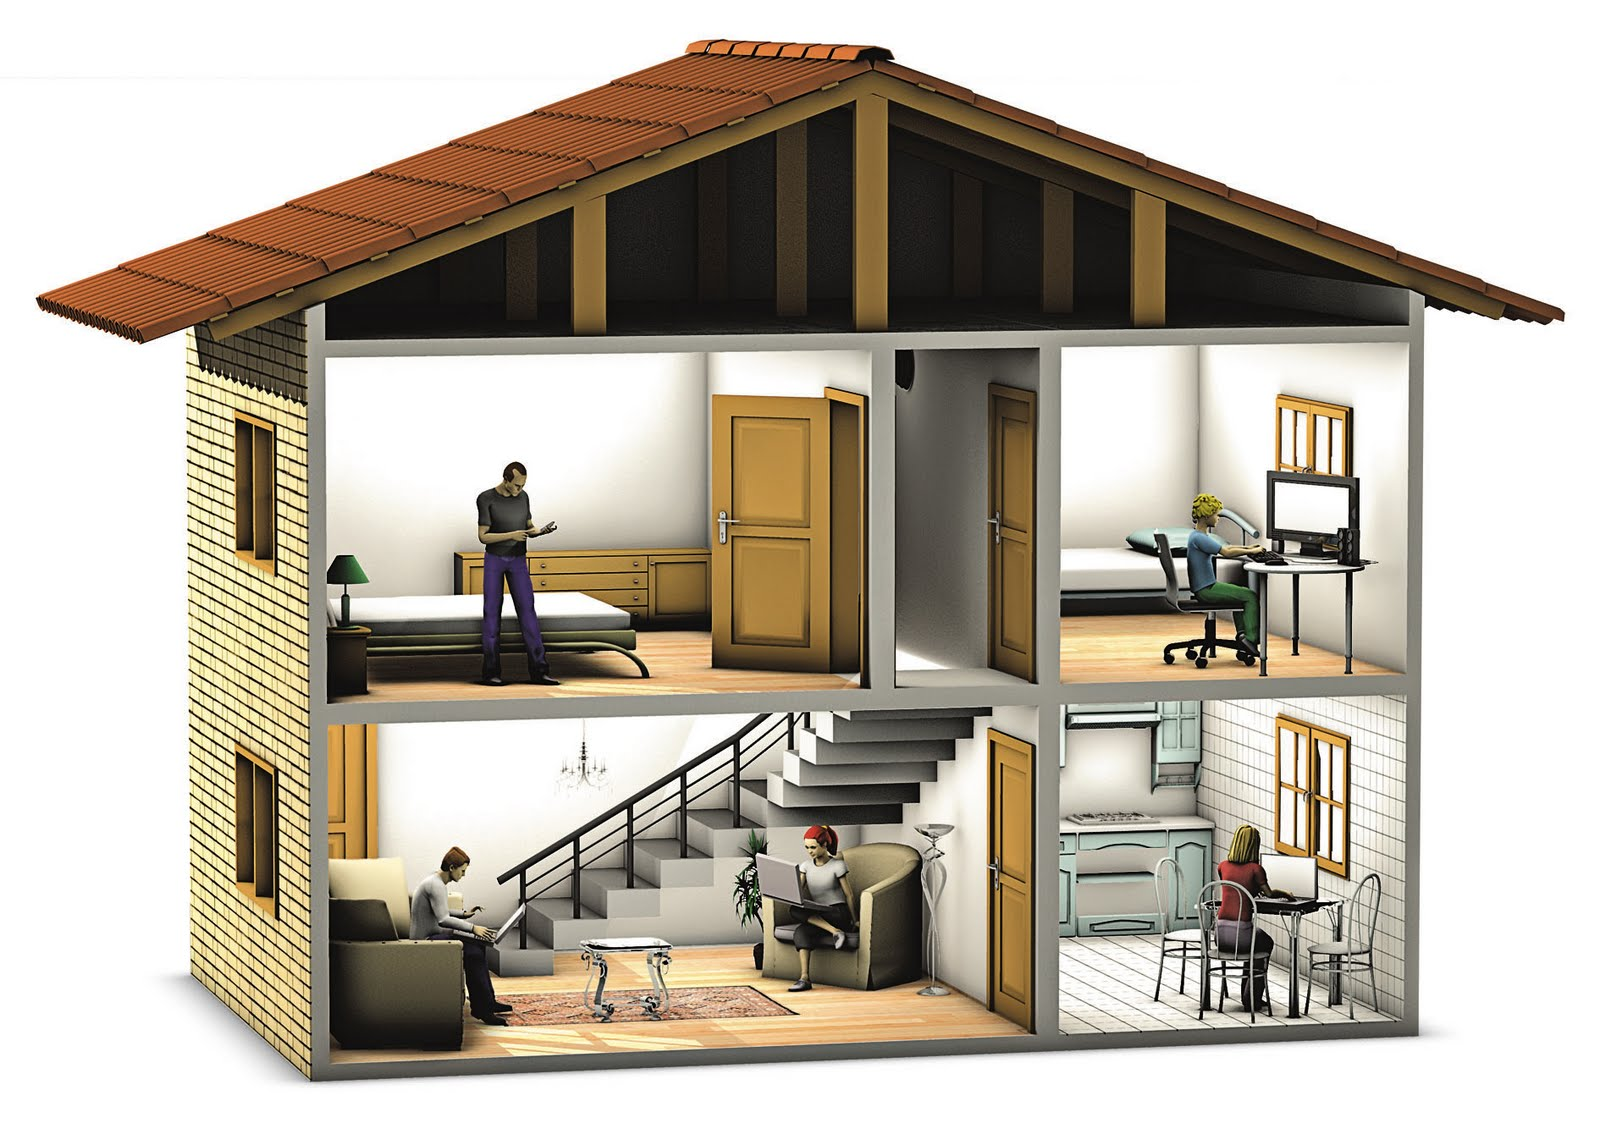 Felipe nadaes brum ilustra casa 3d for Casas 3d